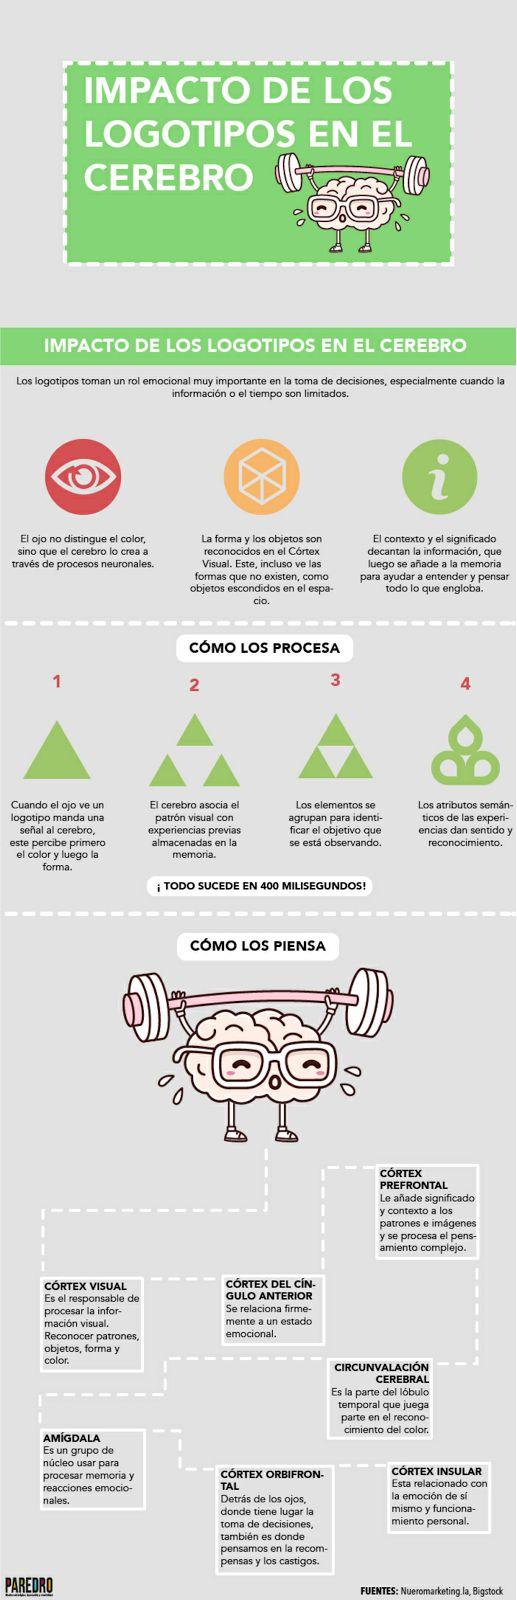 impacto-logotipos-cerebro-infografia